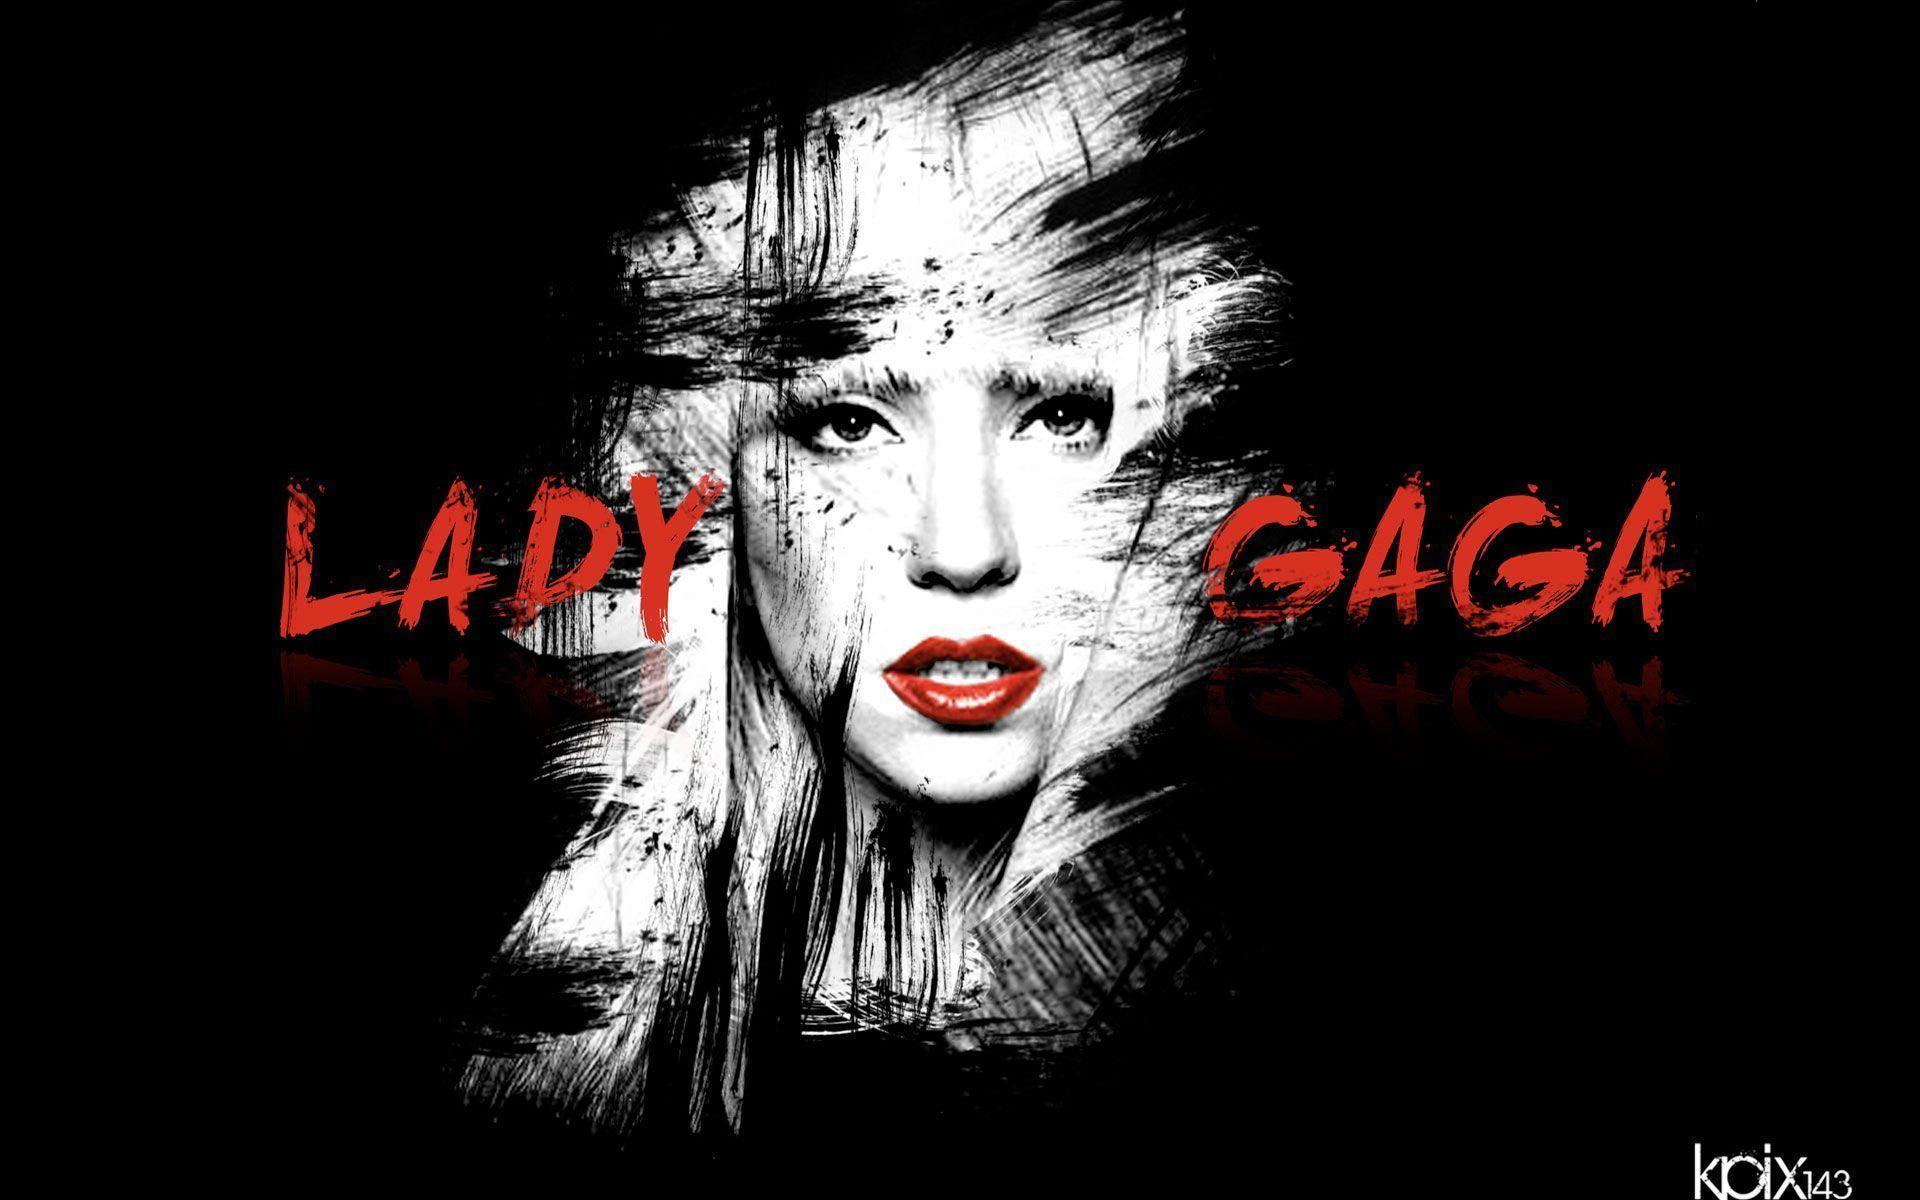 Lady Gaga Desktop Wallpaper